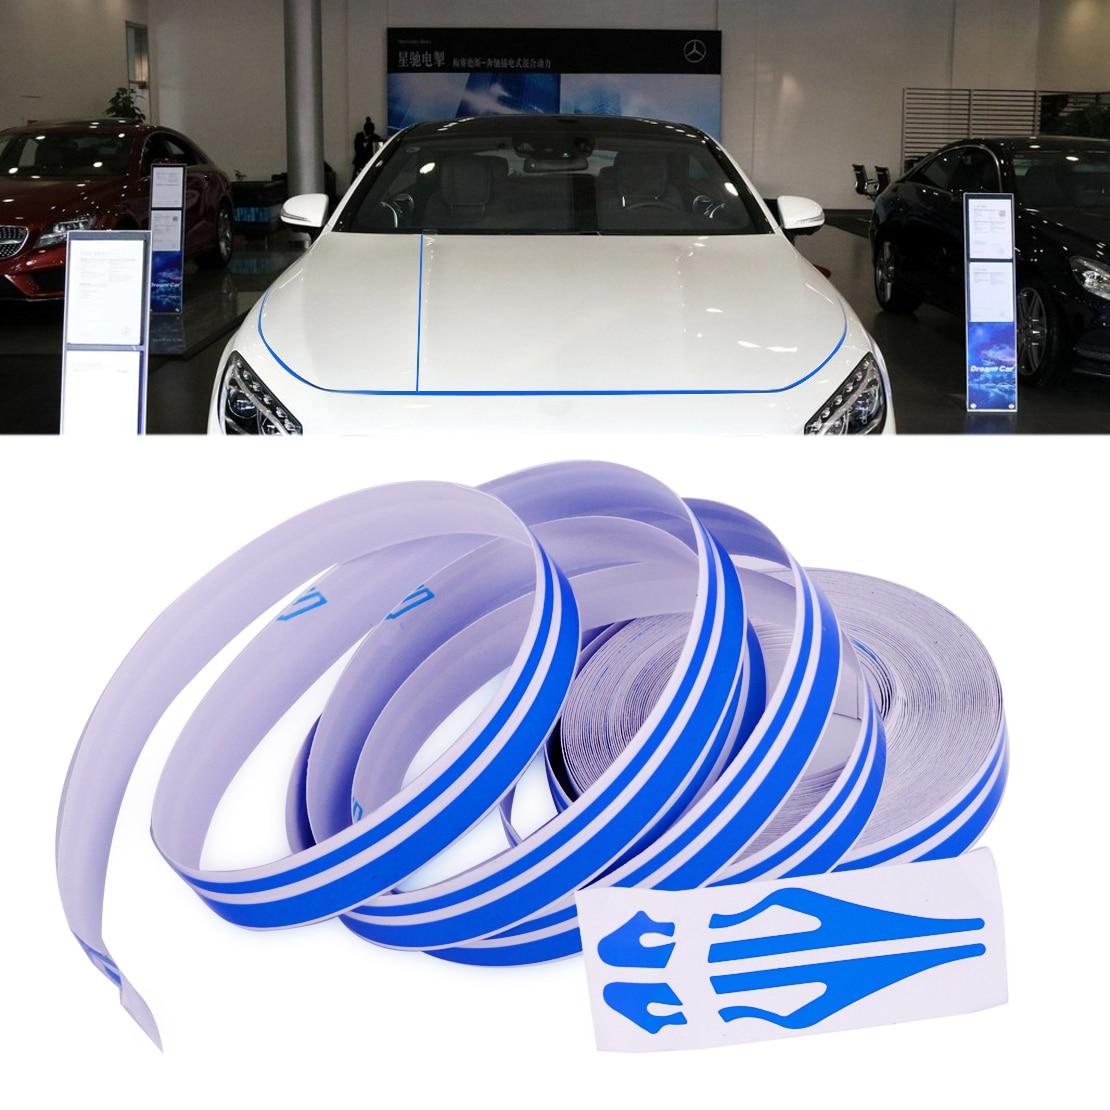 Citall 12mm X 980cm Car Body Striping Sticker Double Line